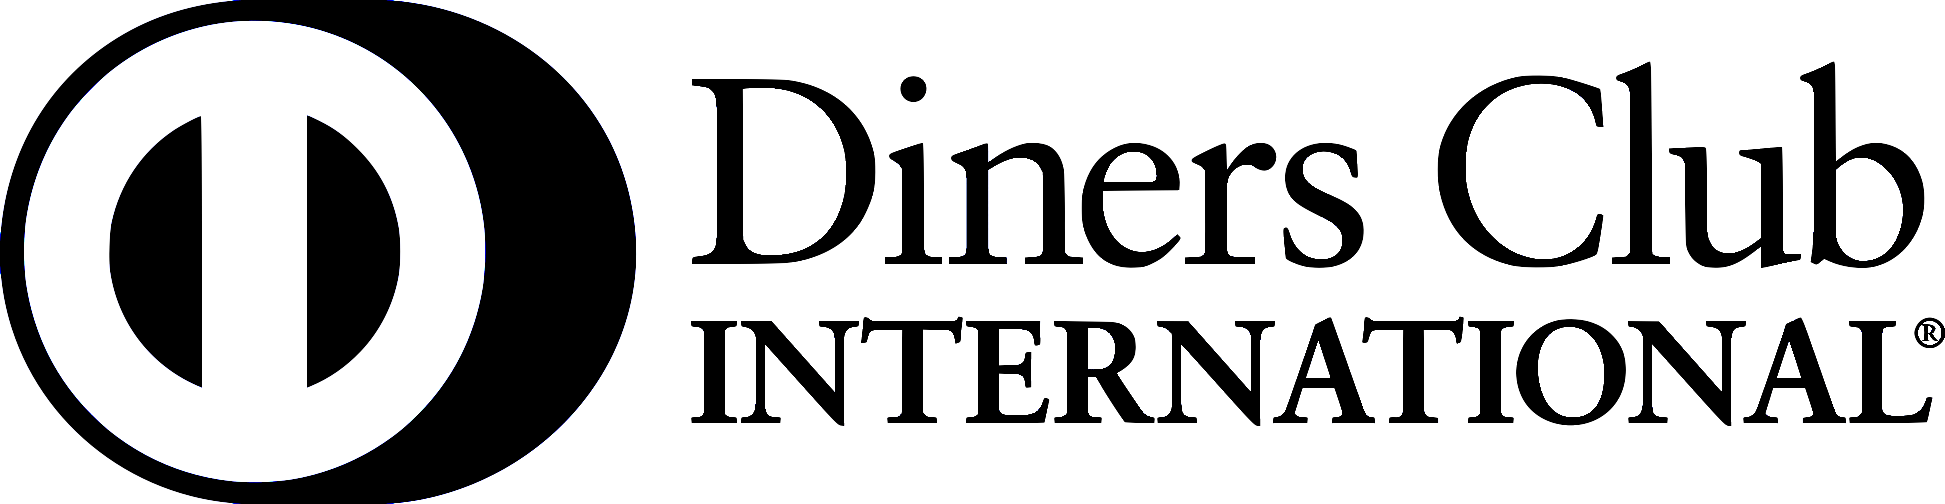 Diners Club black